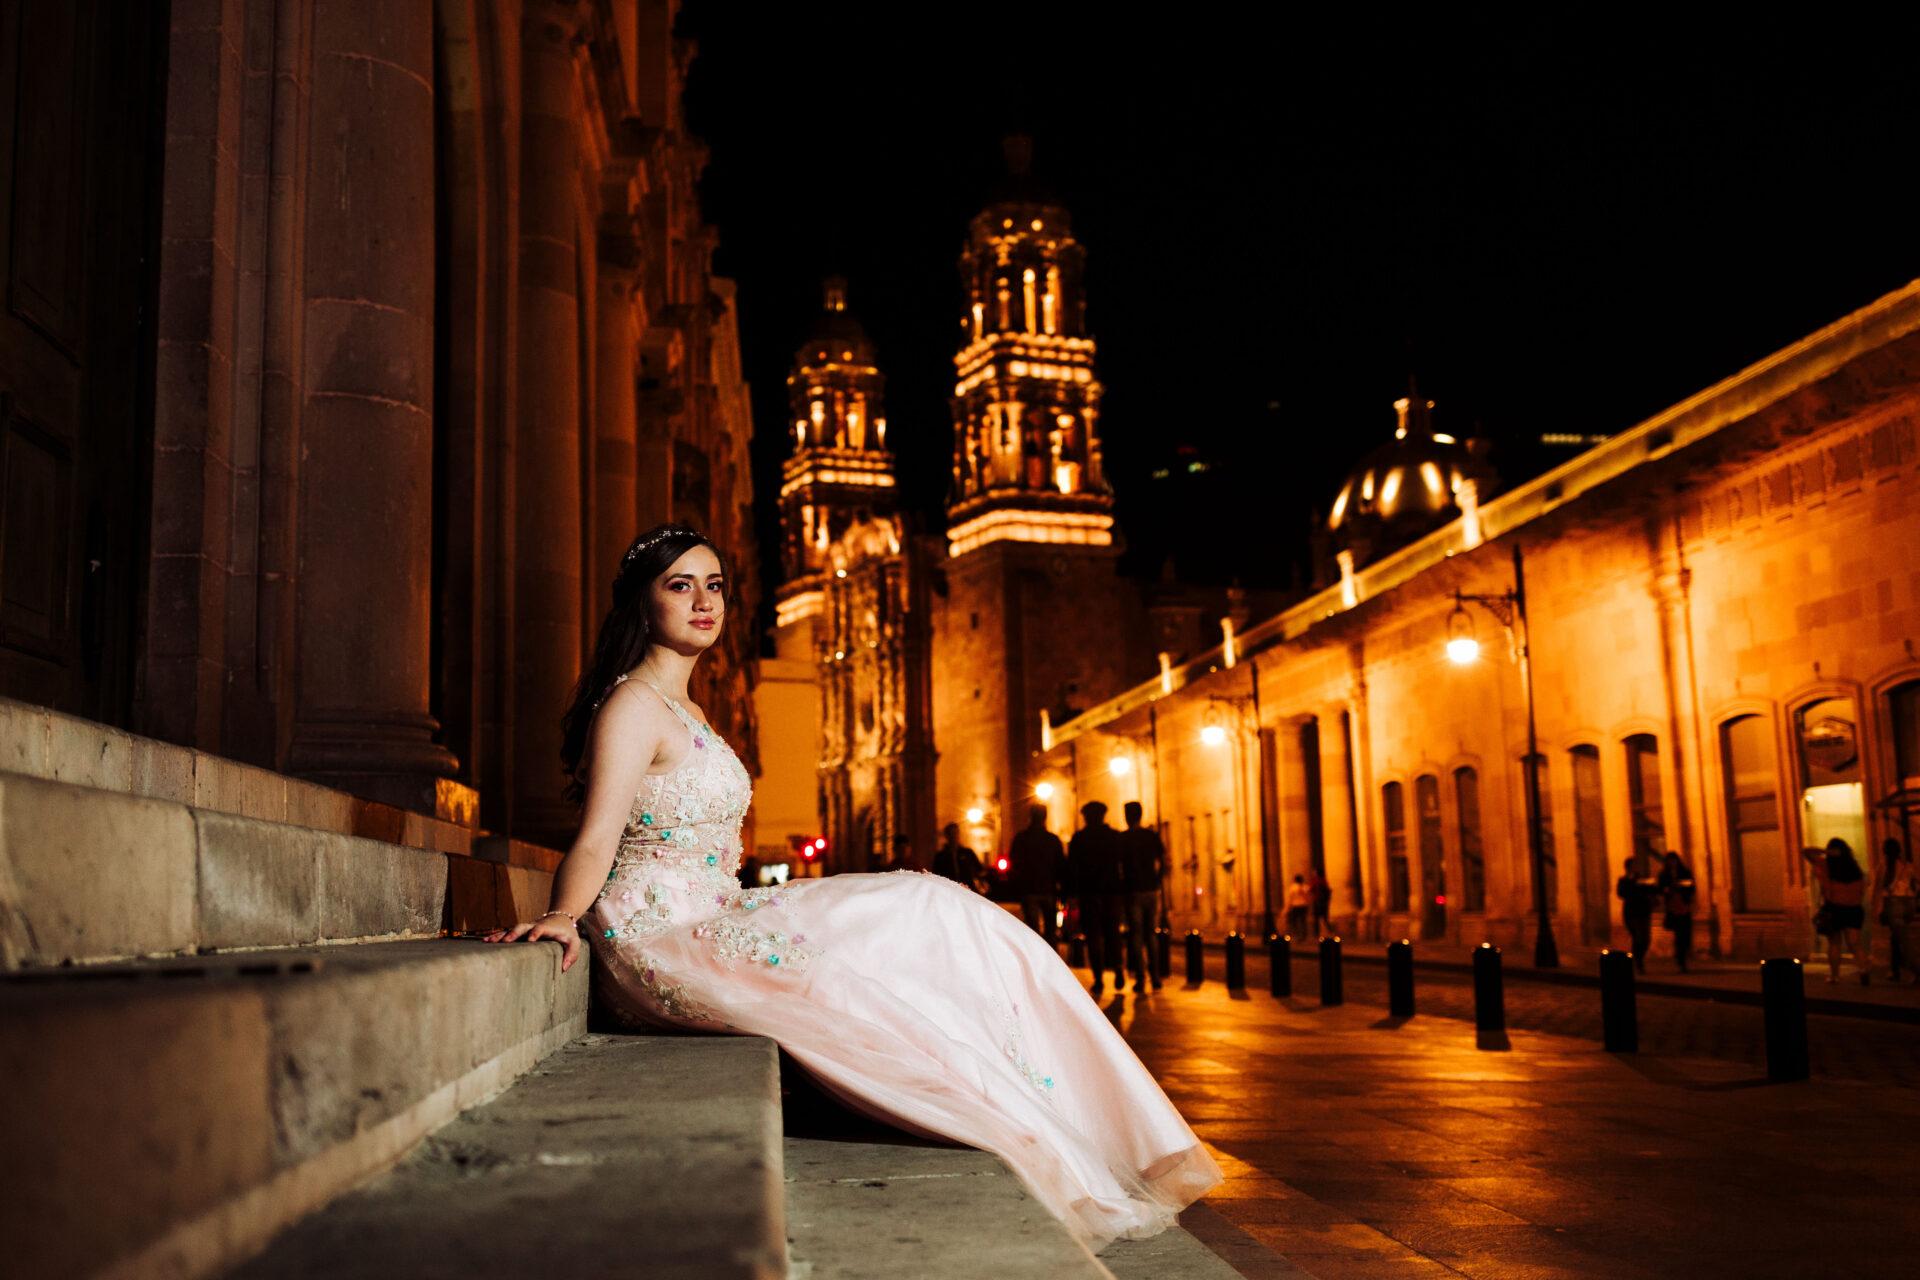 javier_noriega_fotografo_bodas_zacatecas_trash_the_dress_xv_años00010